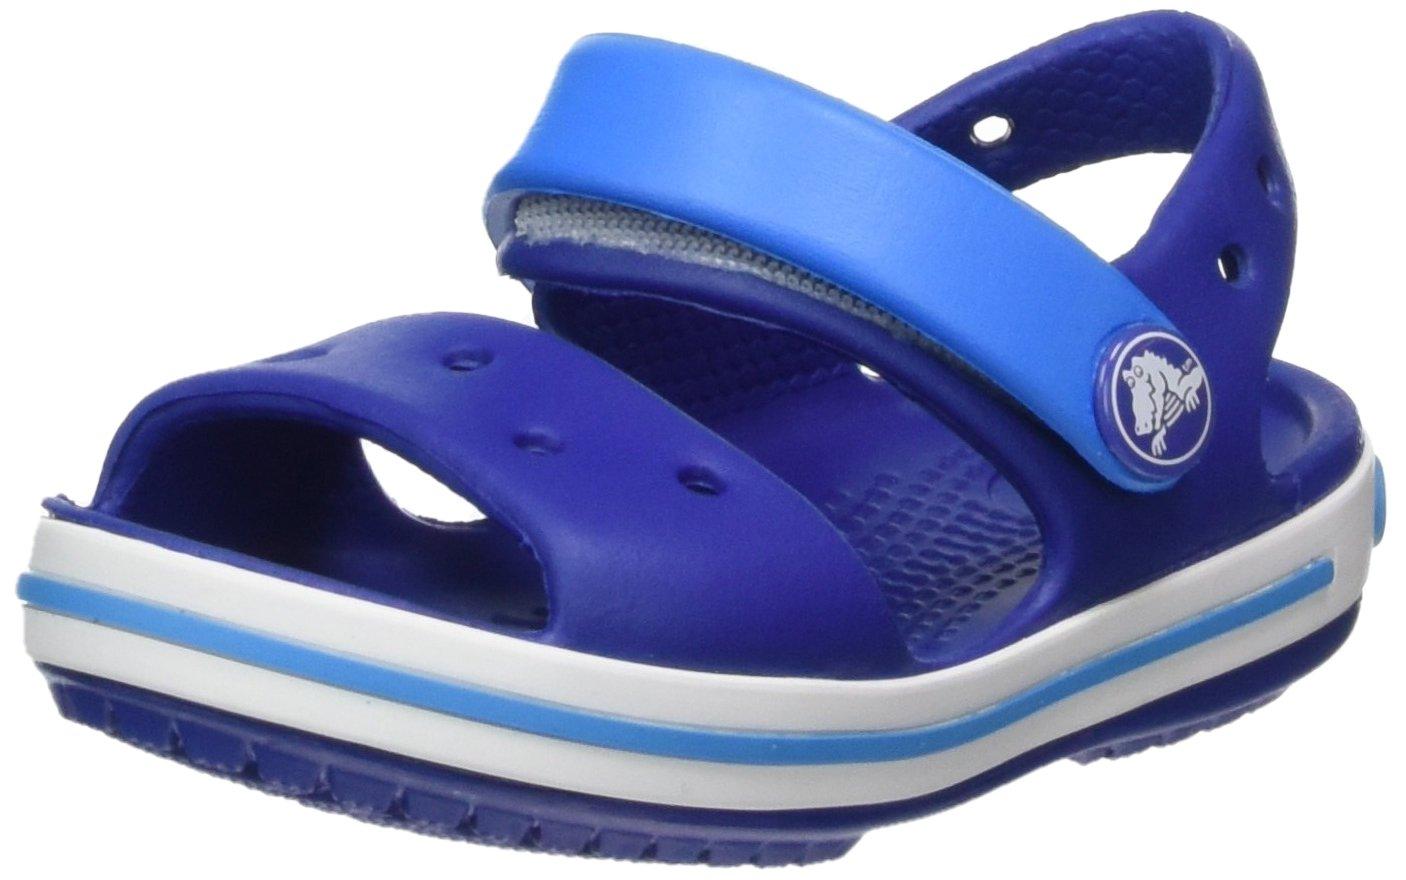 Crocs Unisex-Kids Crocband Sandal, Cerulean Blue/Ocean, 2 M US Little Kid